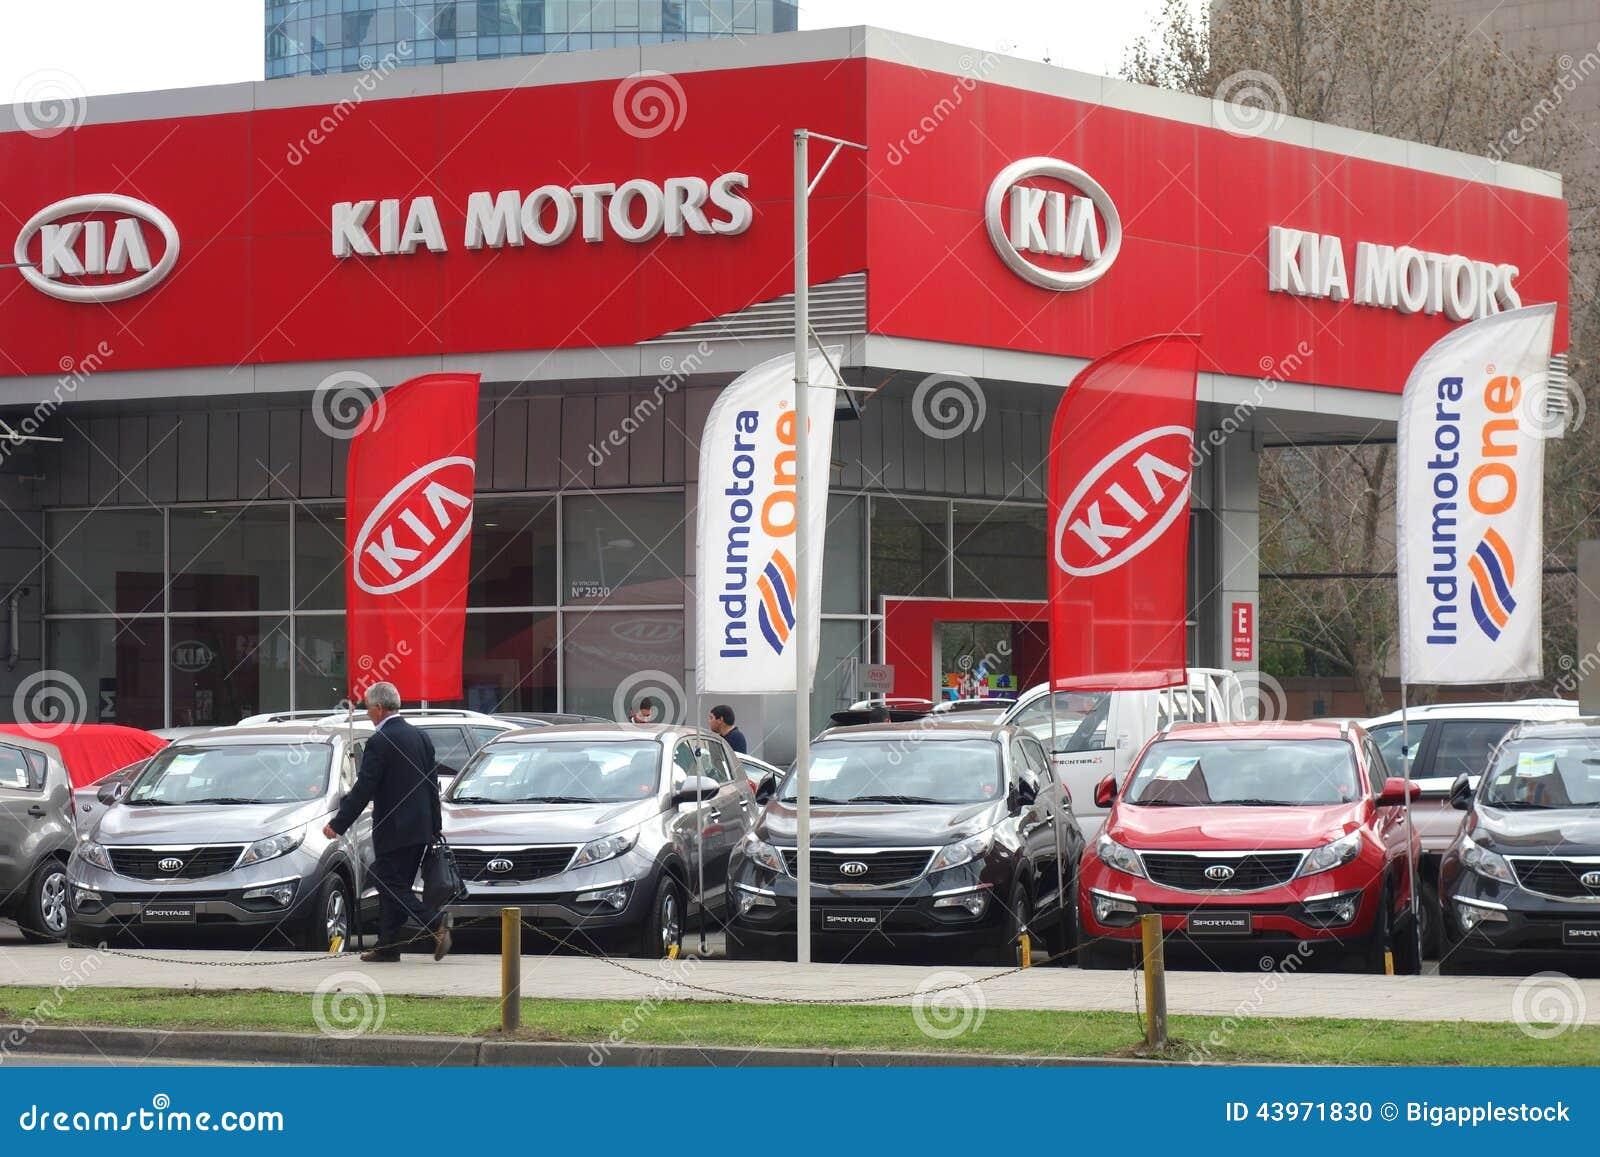 Kia motors dealer editorial image image of korea for Kia motors south korea